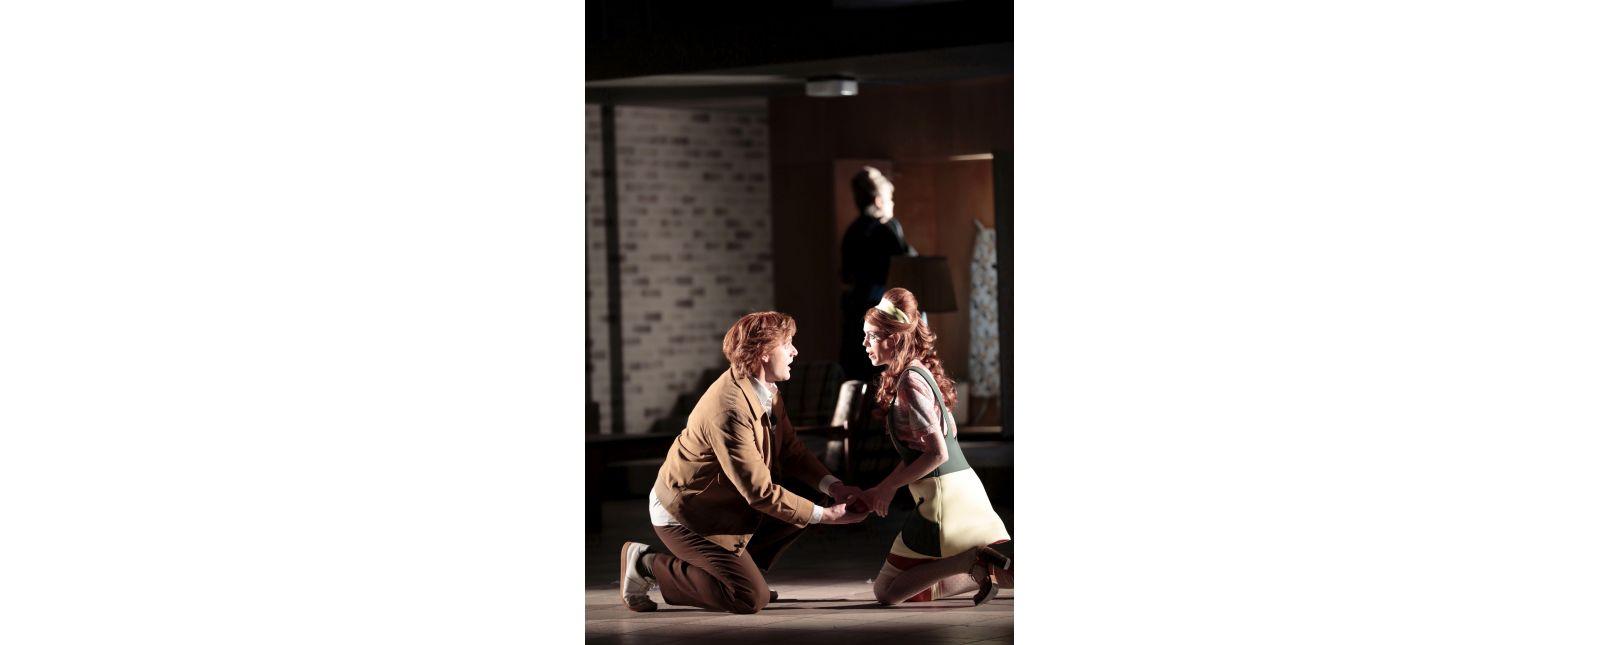 Falstaff // Joshua Kohl / Samantha Gaul / Anja Jung // 2019 // Paul Leclaire